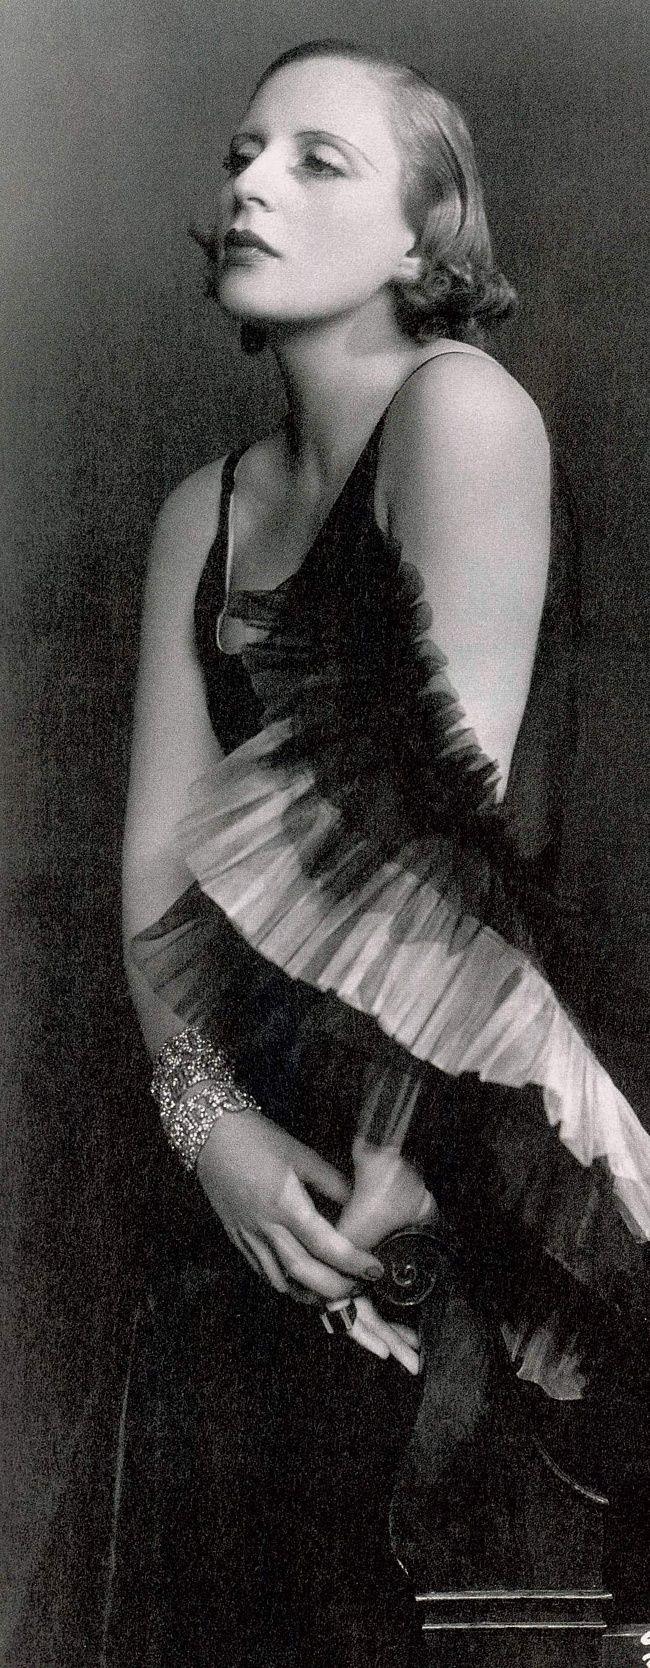 Tamara de Lempicka - 1929 - Photo by Dora Kallmus (Madame d'Ora Studio) - Paris - @~ Watsonette